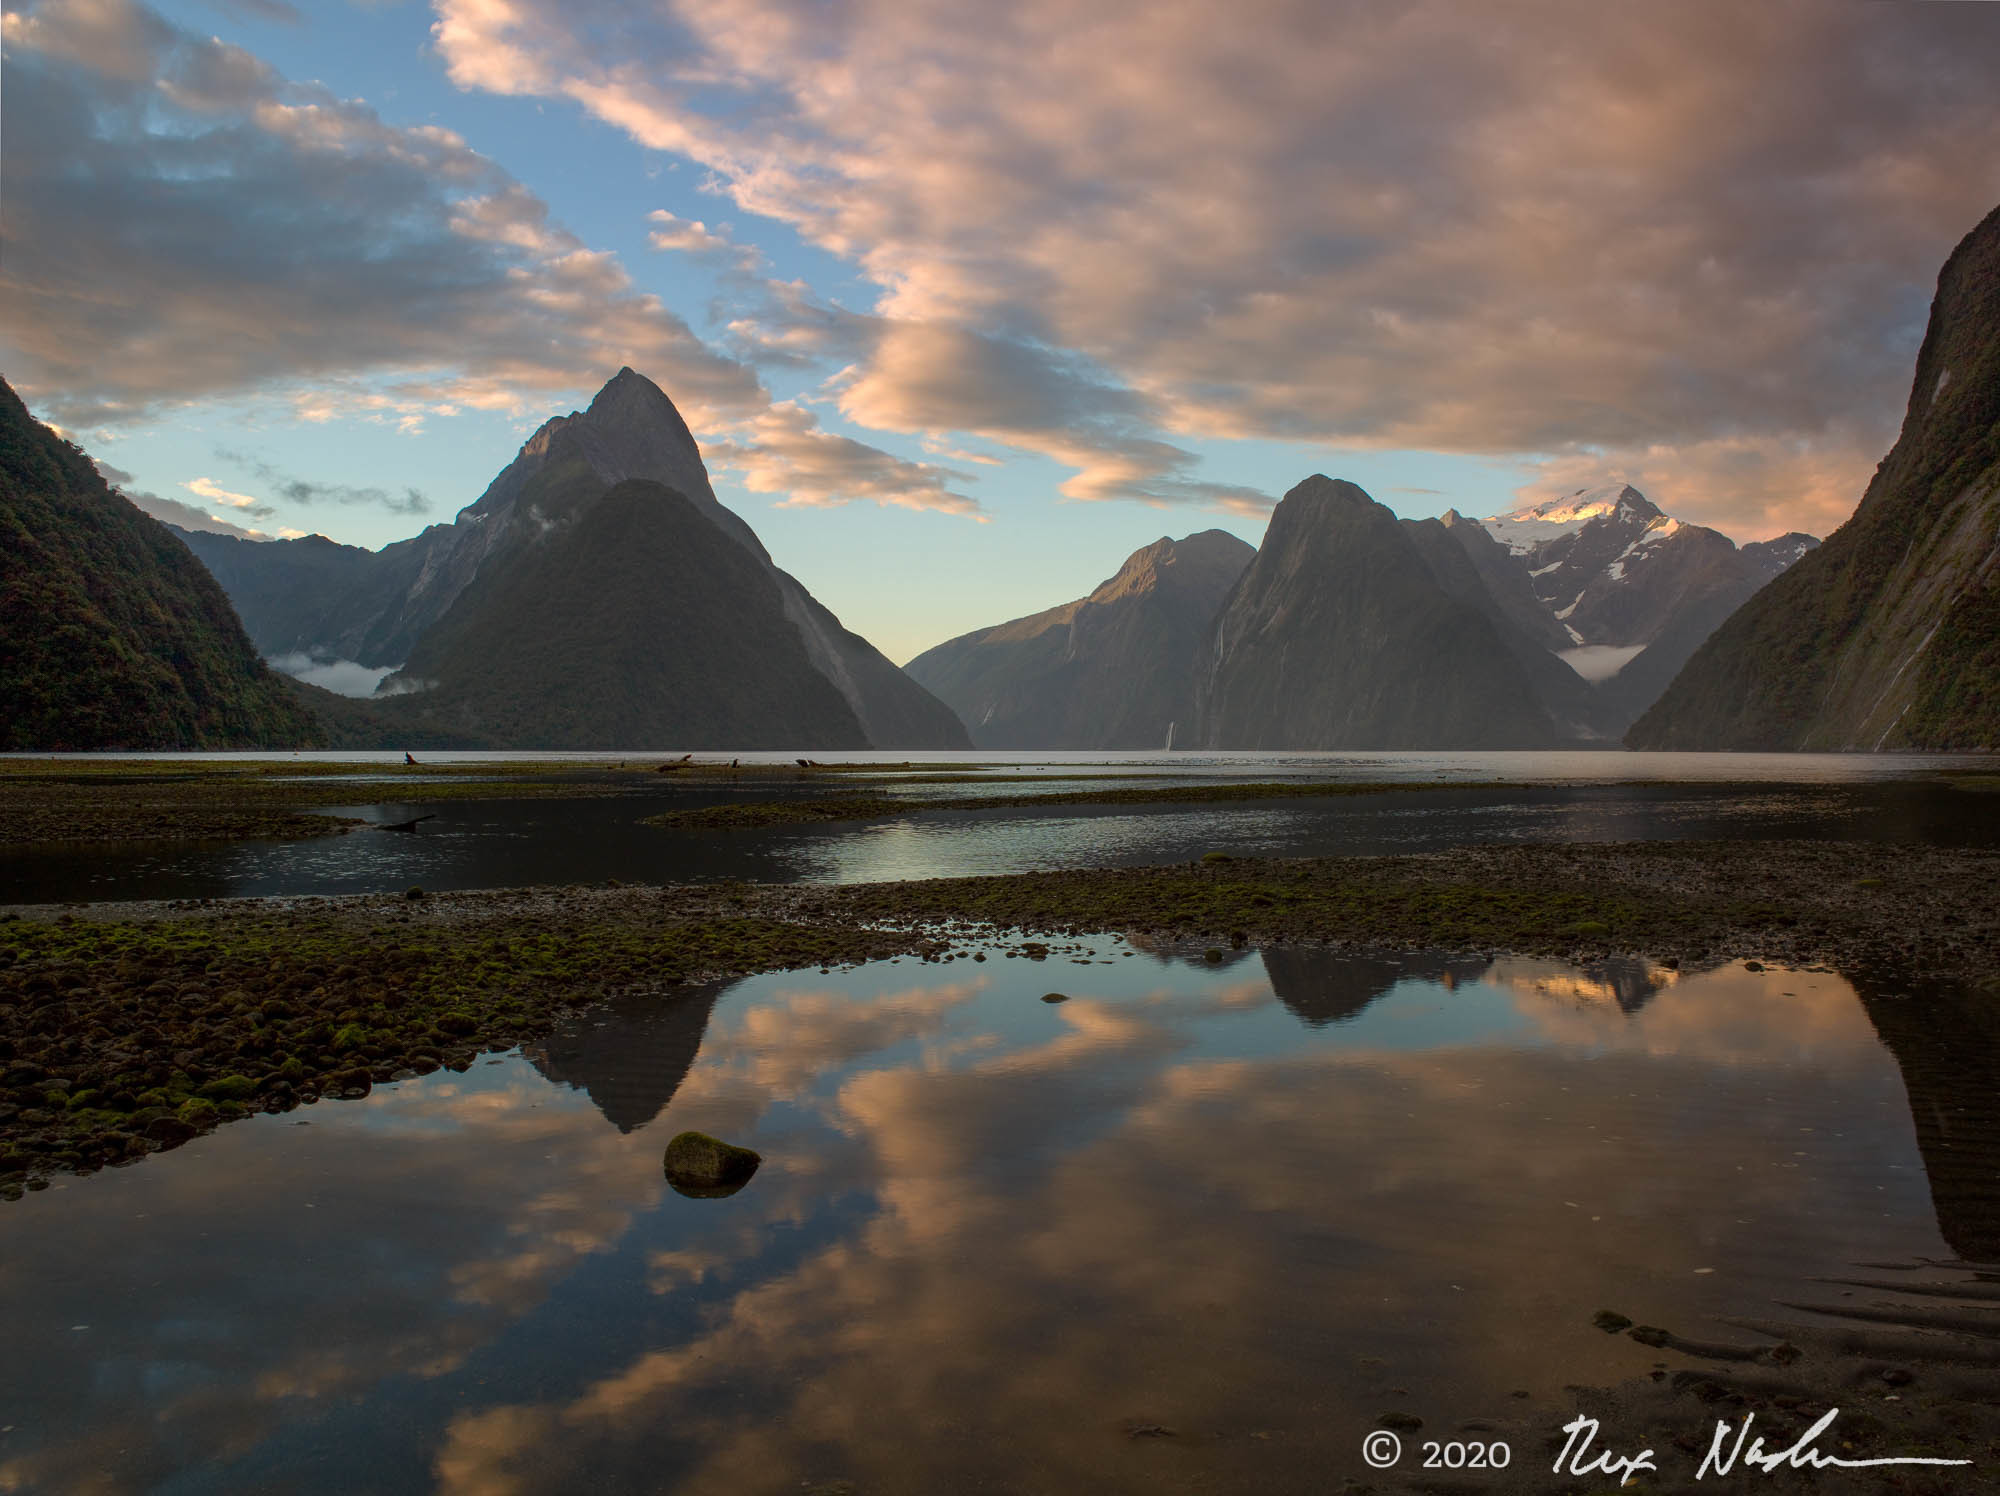 Evening, Milford Sound - South Island, New Zealand